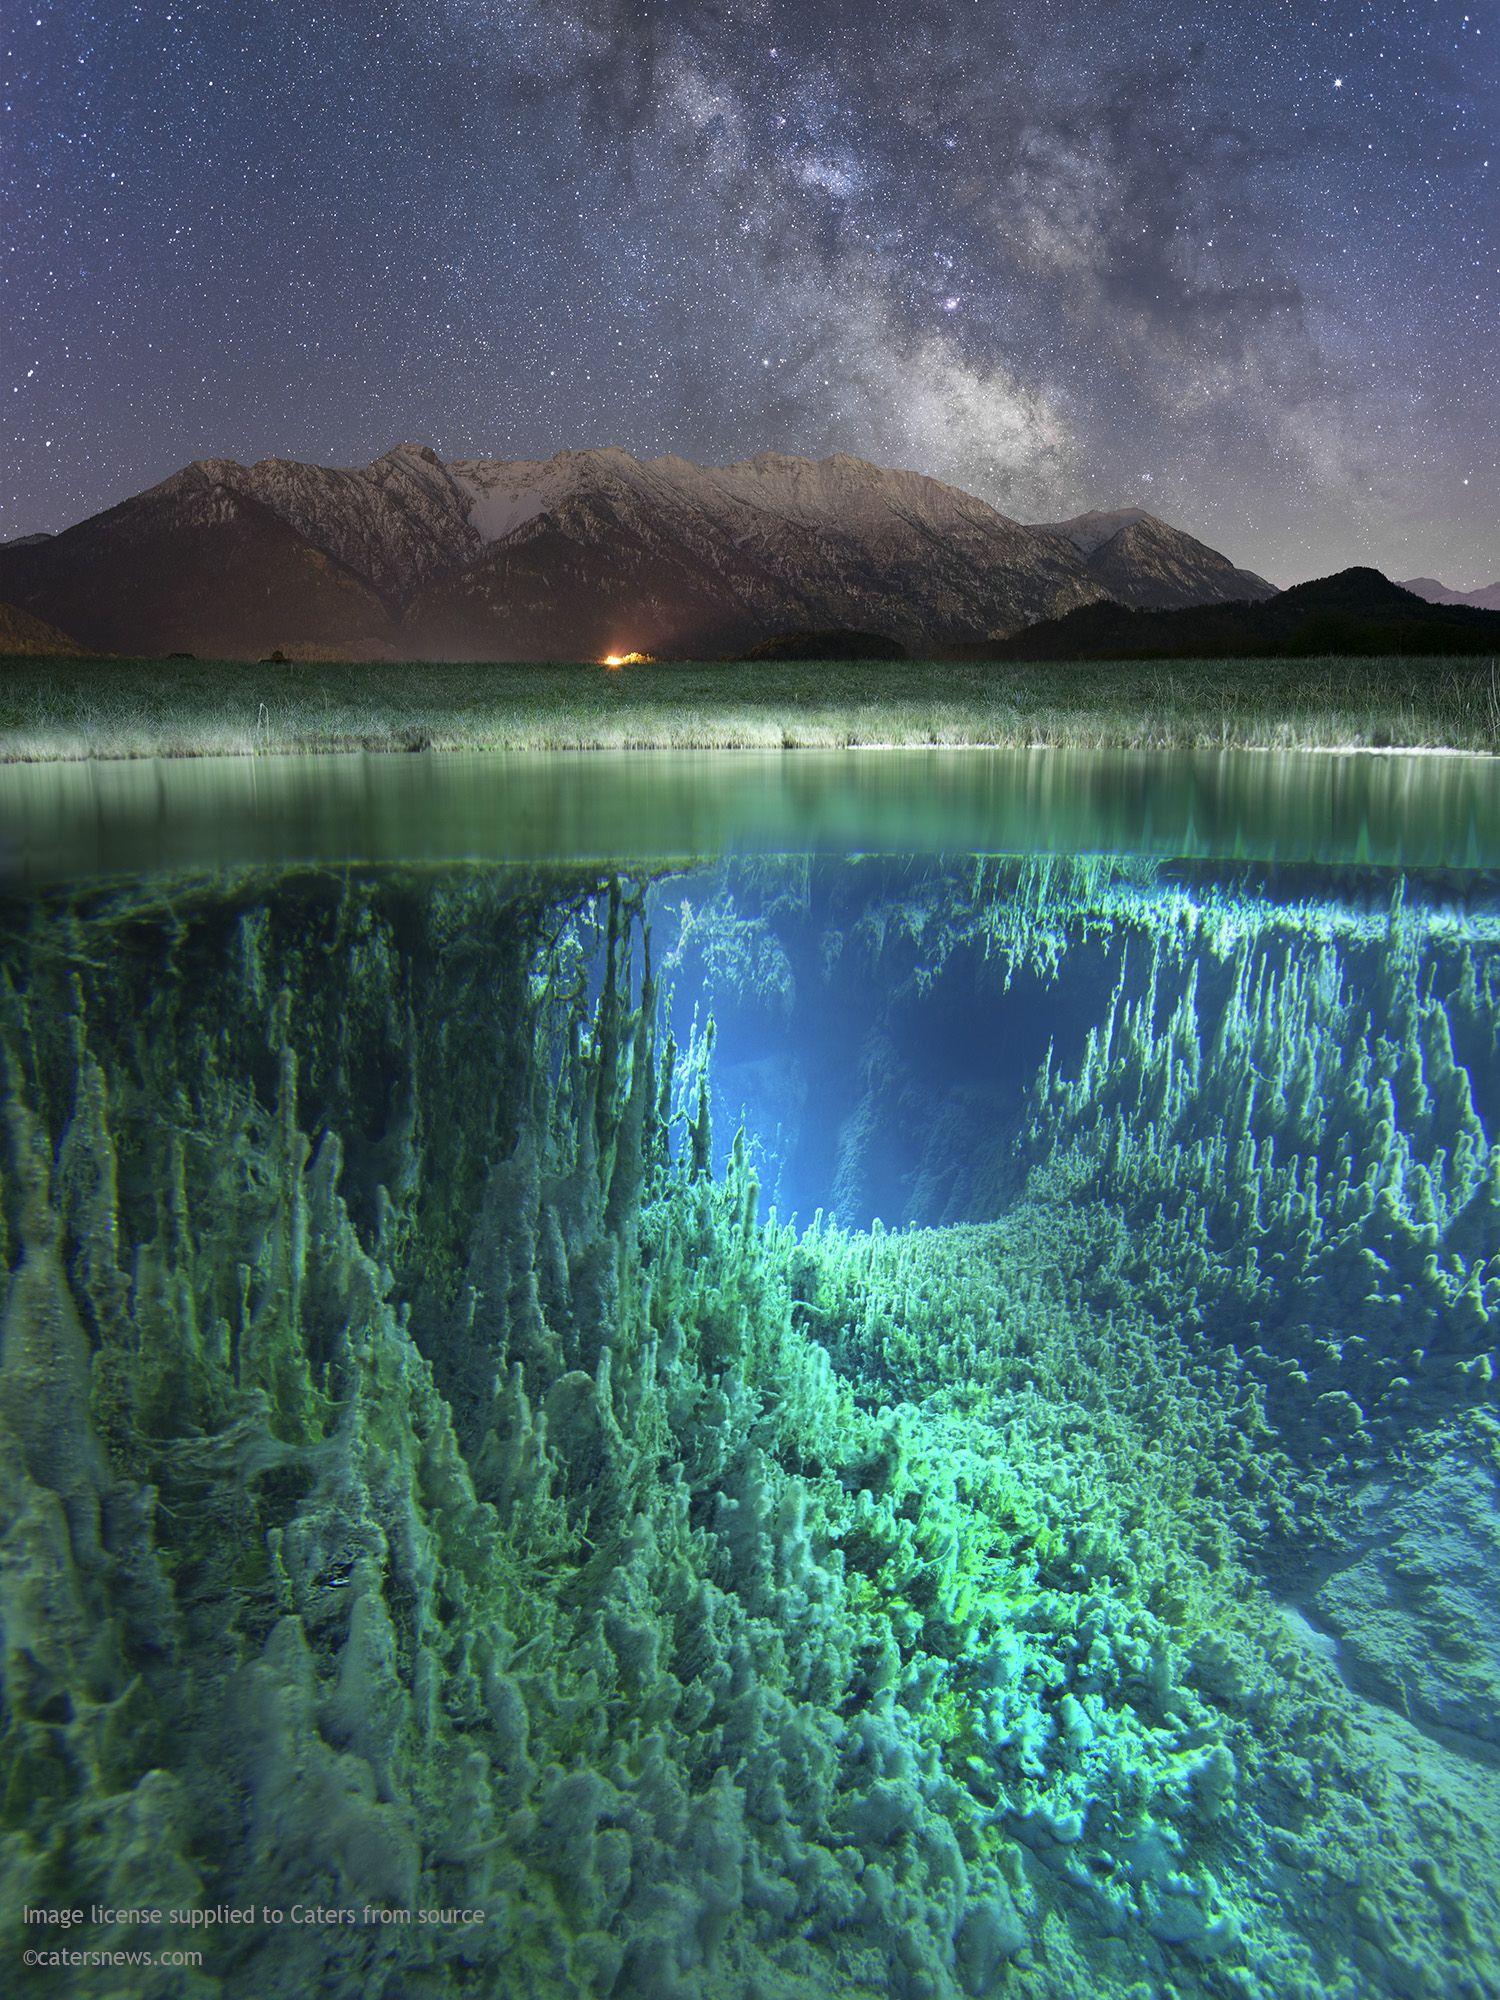 ausmalbilder natur landschaft wald berge meer insel